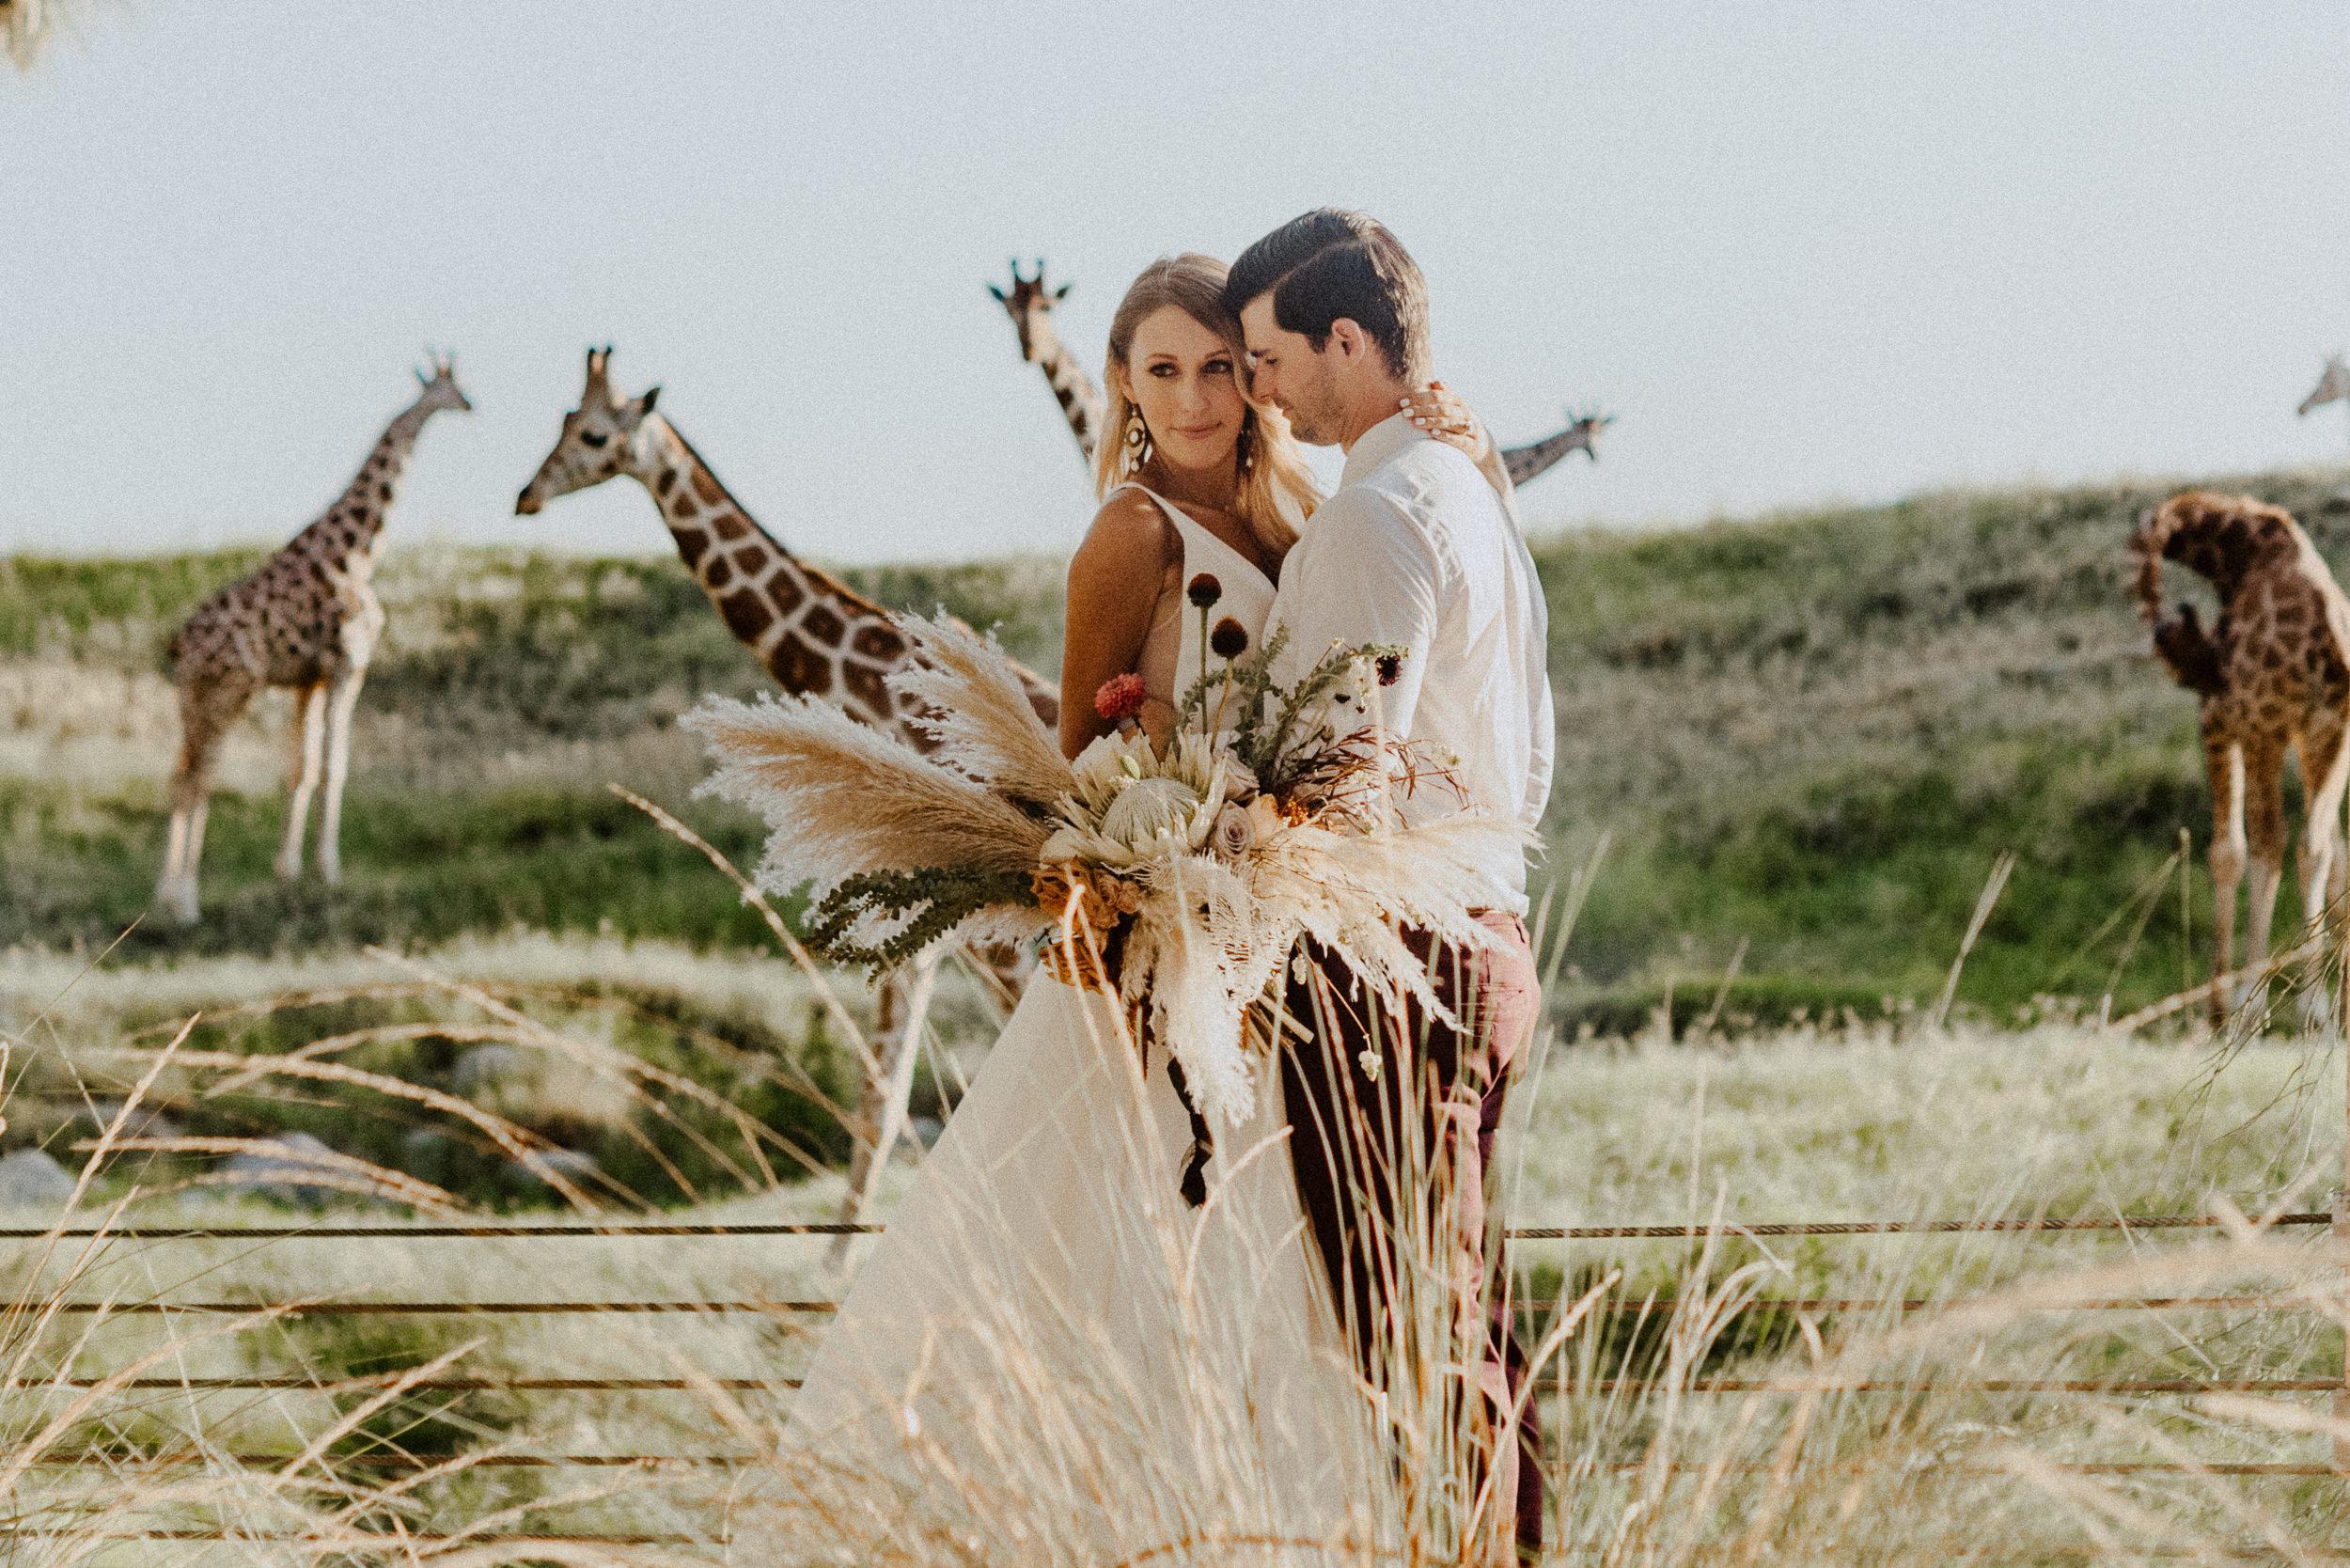 sChelsie + Chris - The Desert Shootout Wedding Romantics at The Living Desert-79.jpg